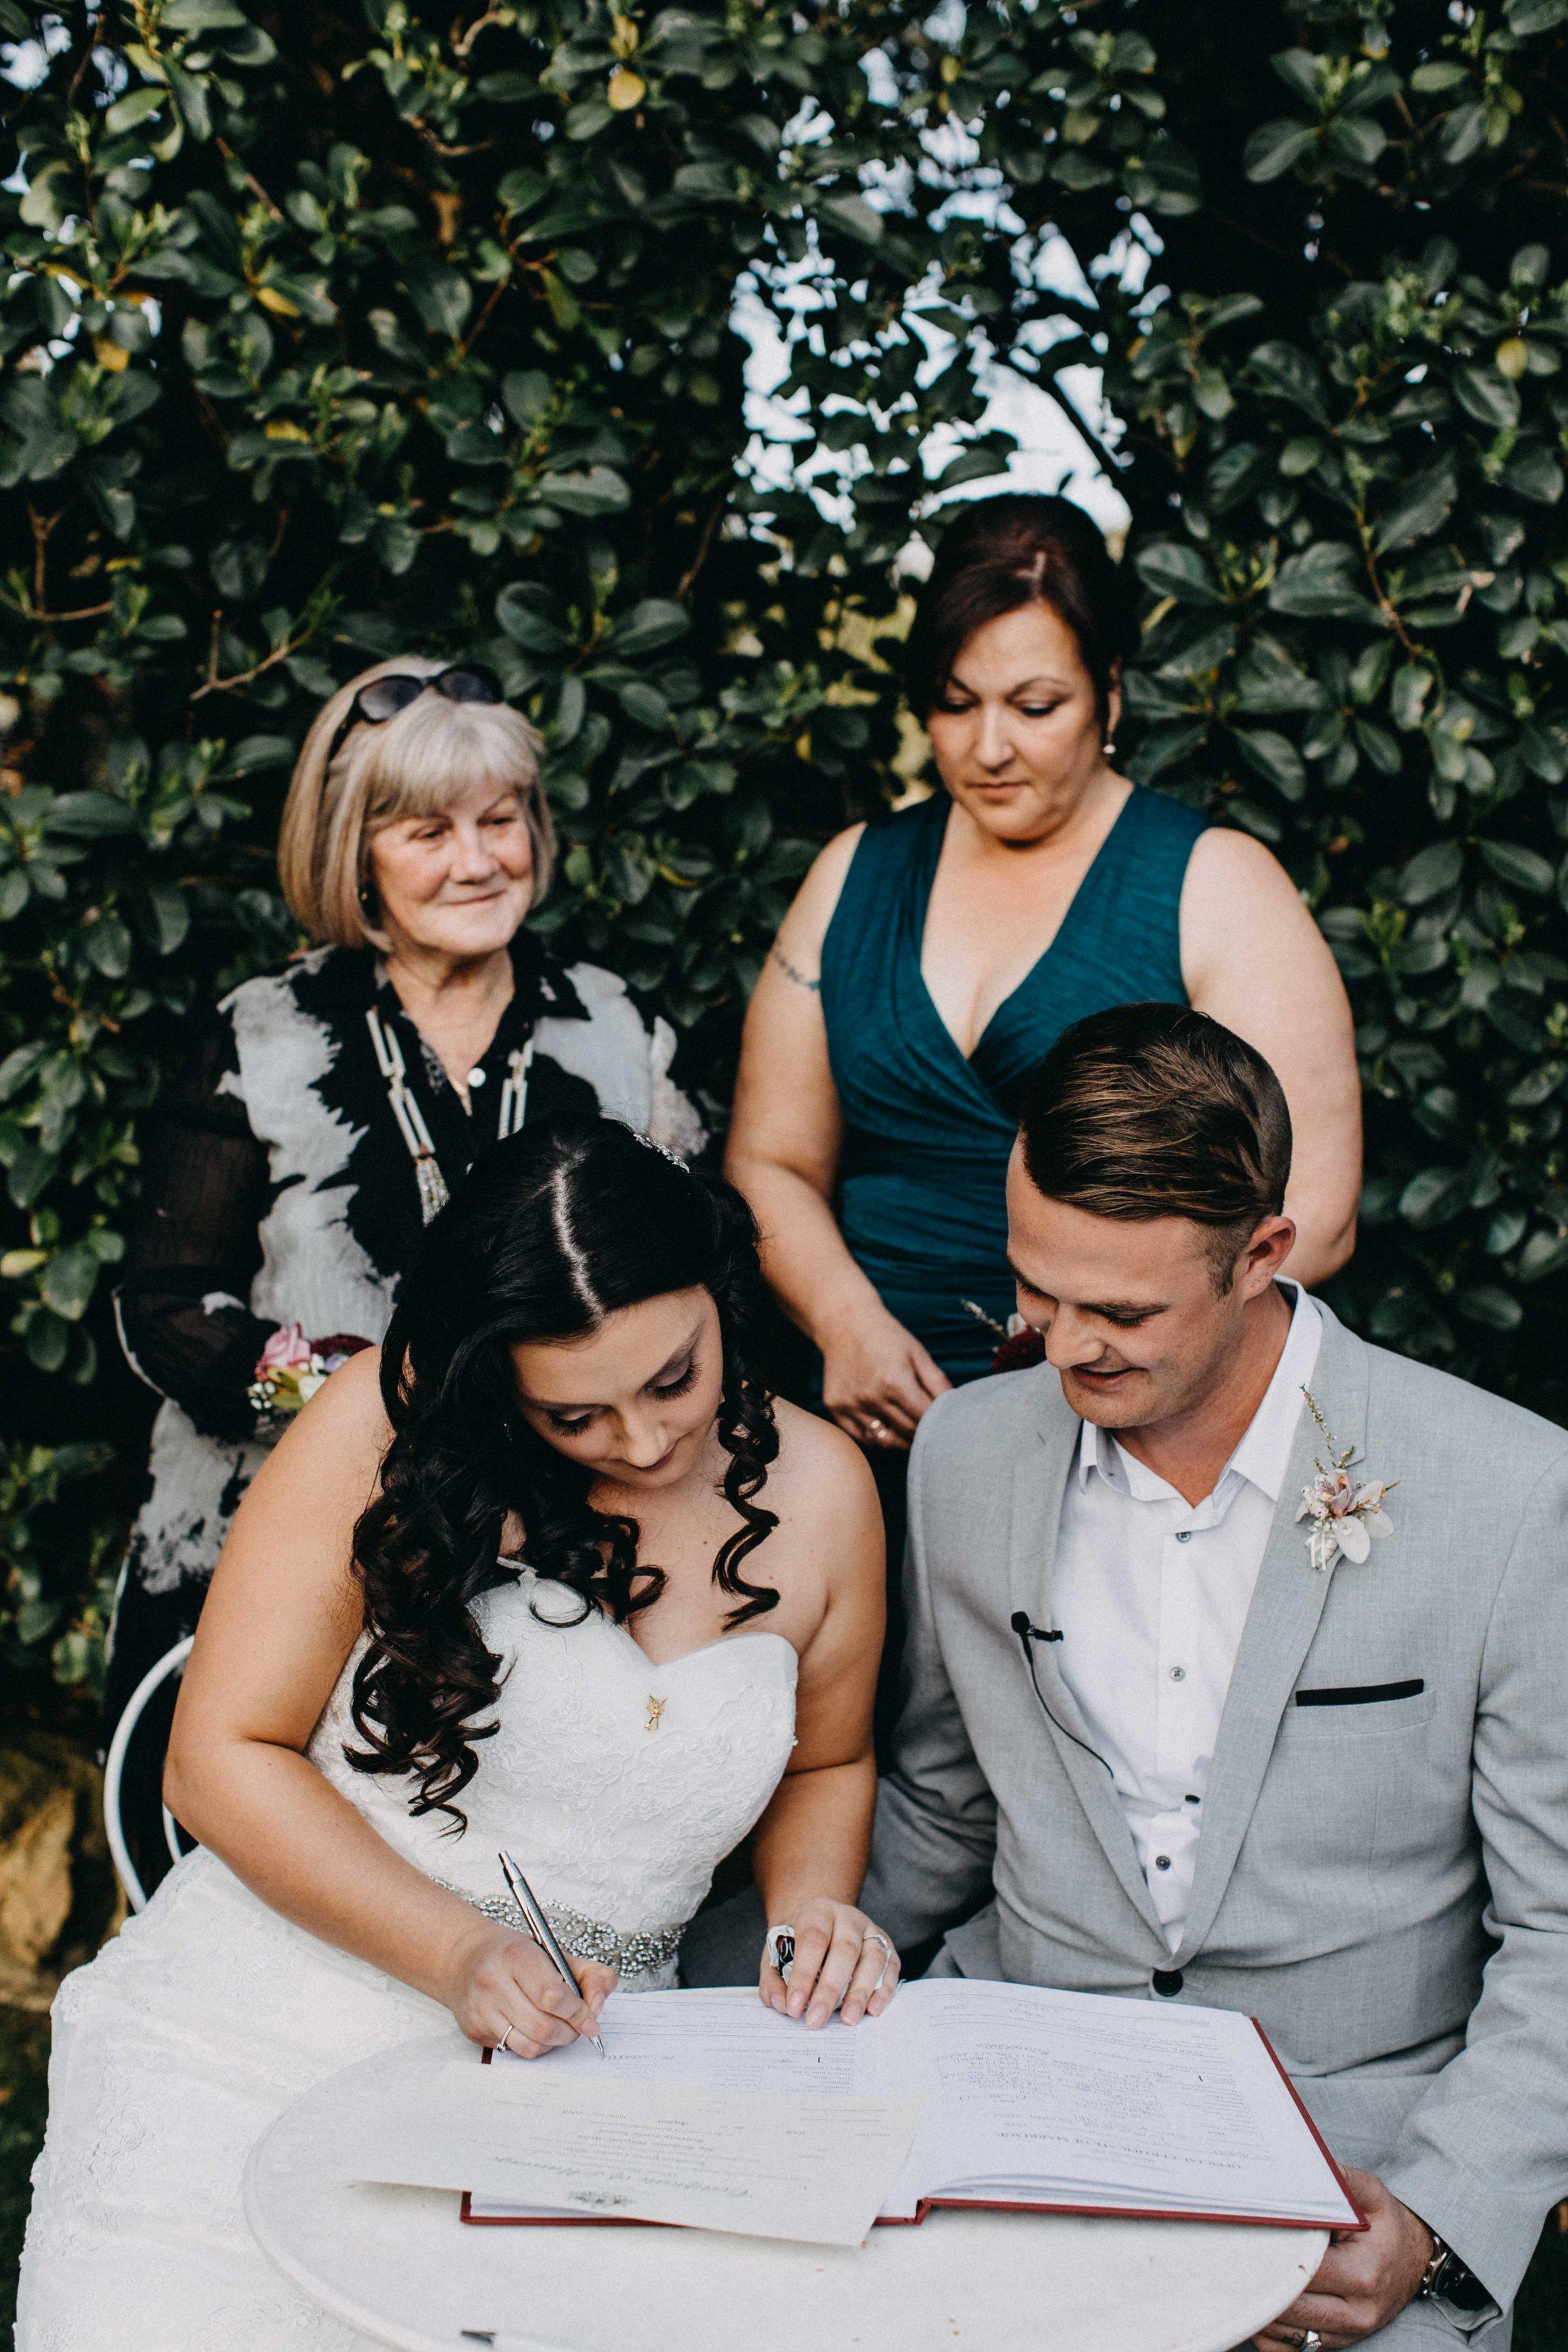 burnham-grove-camden-wedding-emilyobrienphotography-macarthur-74.jpg